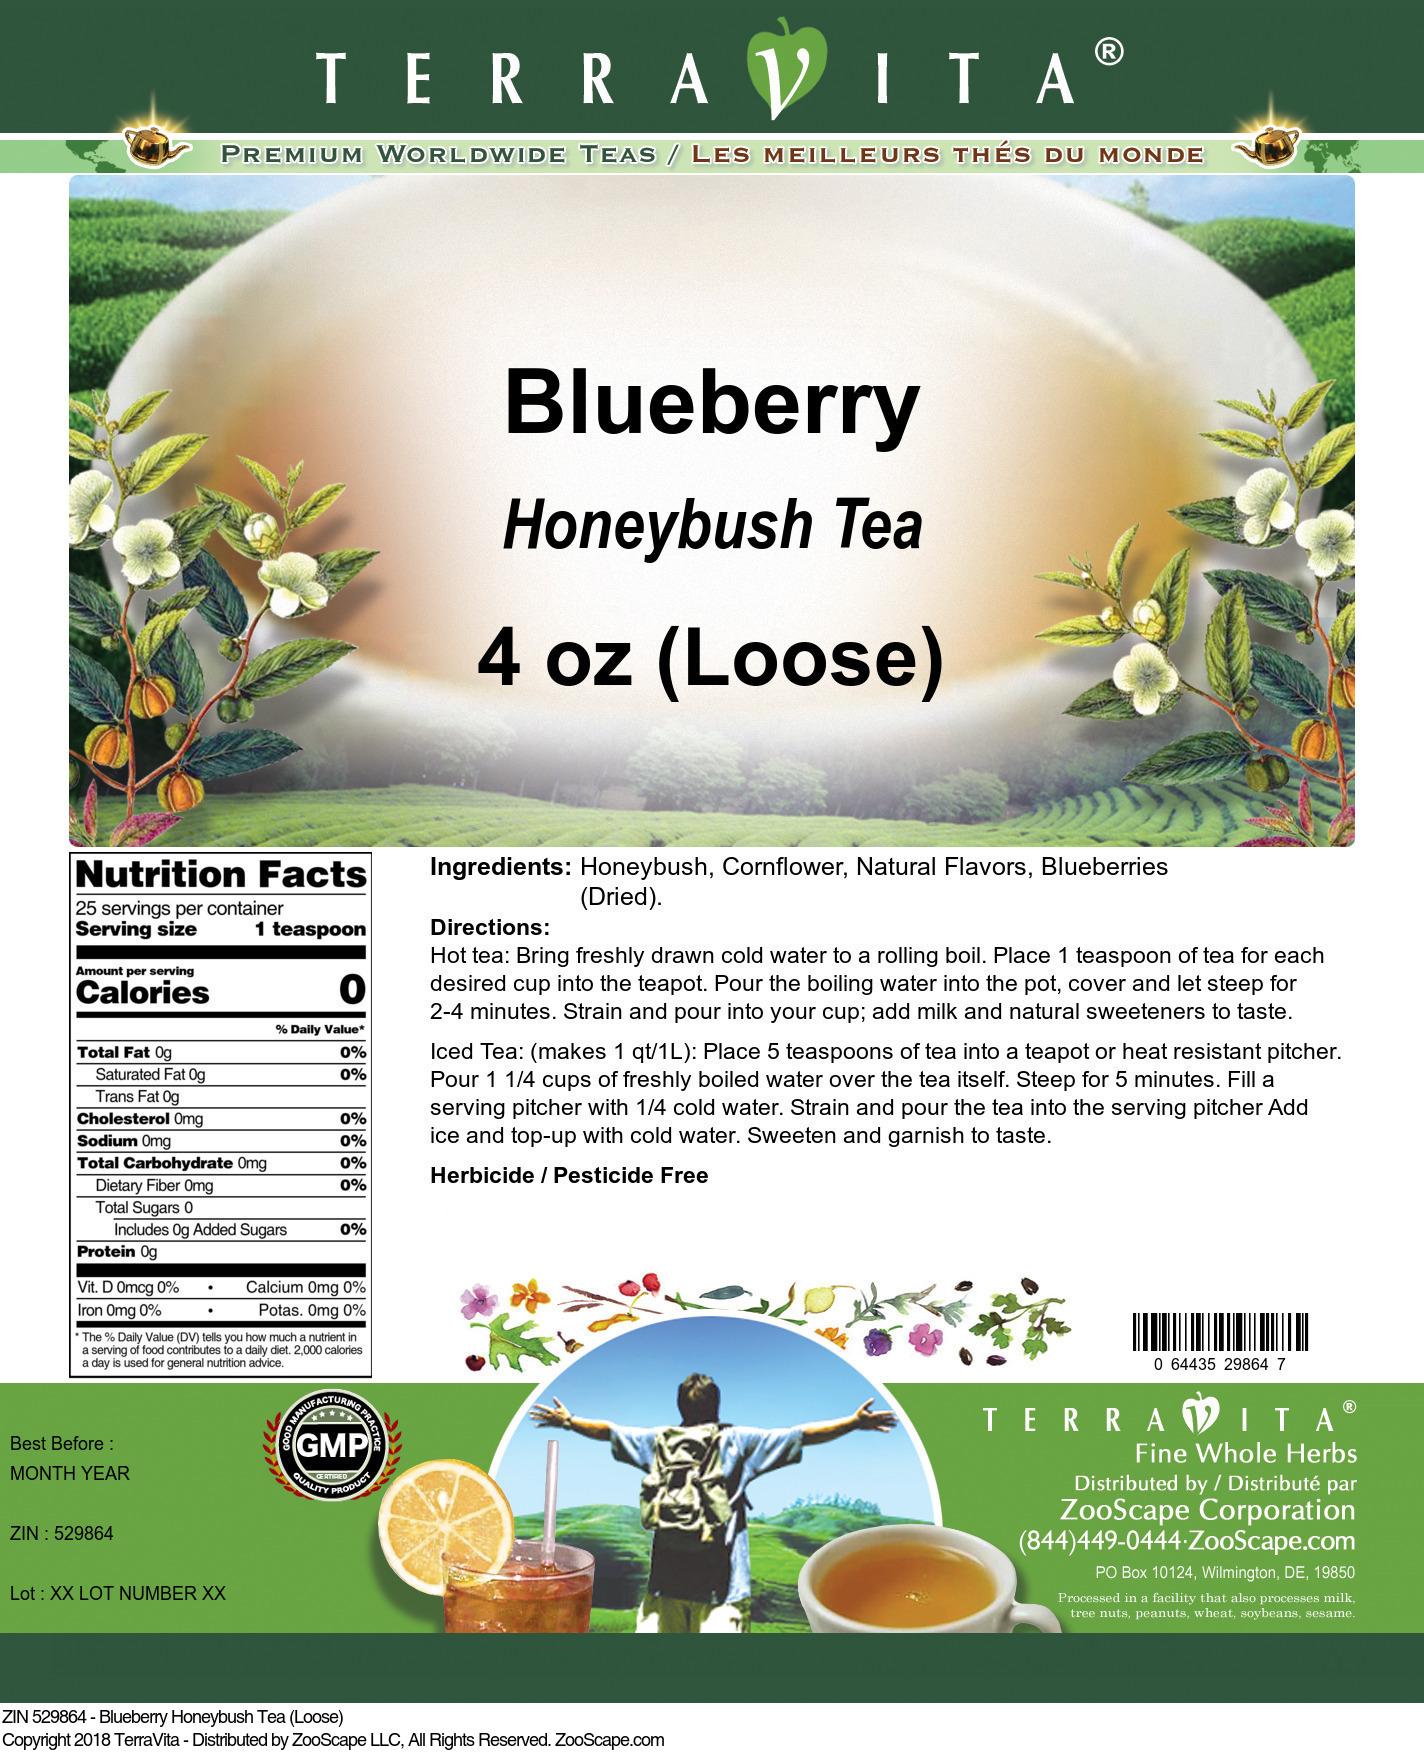 Blueberry Honeybush Tea (Loose)